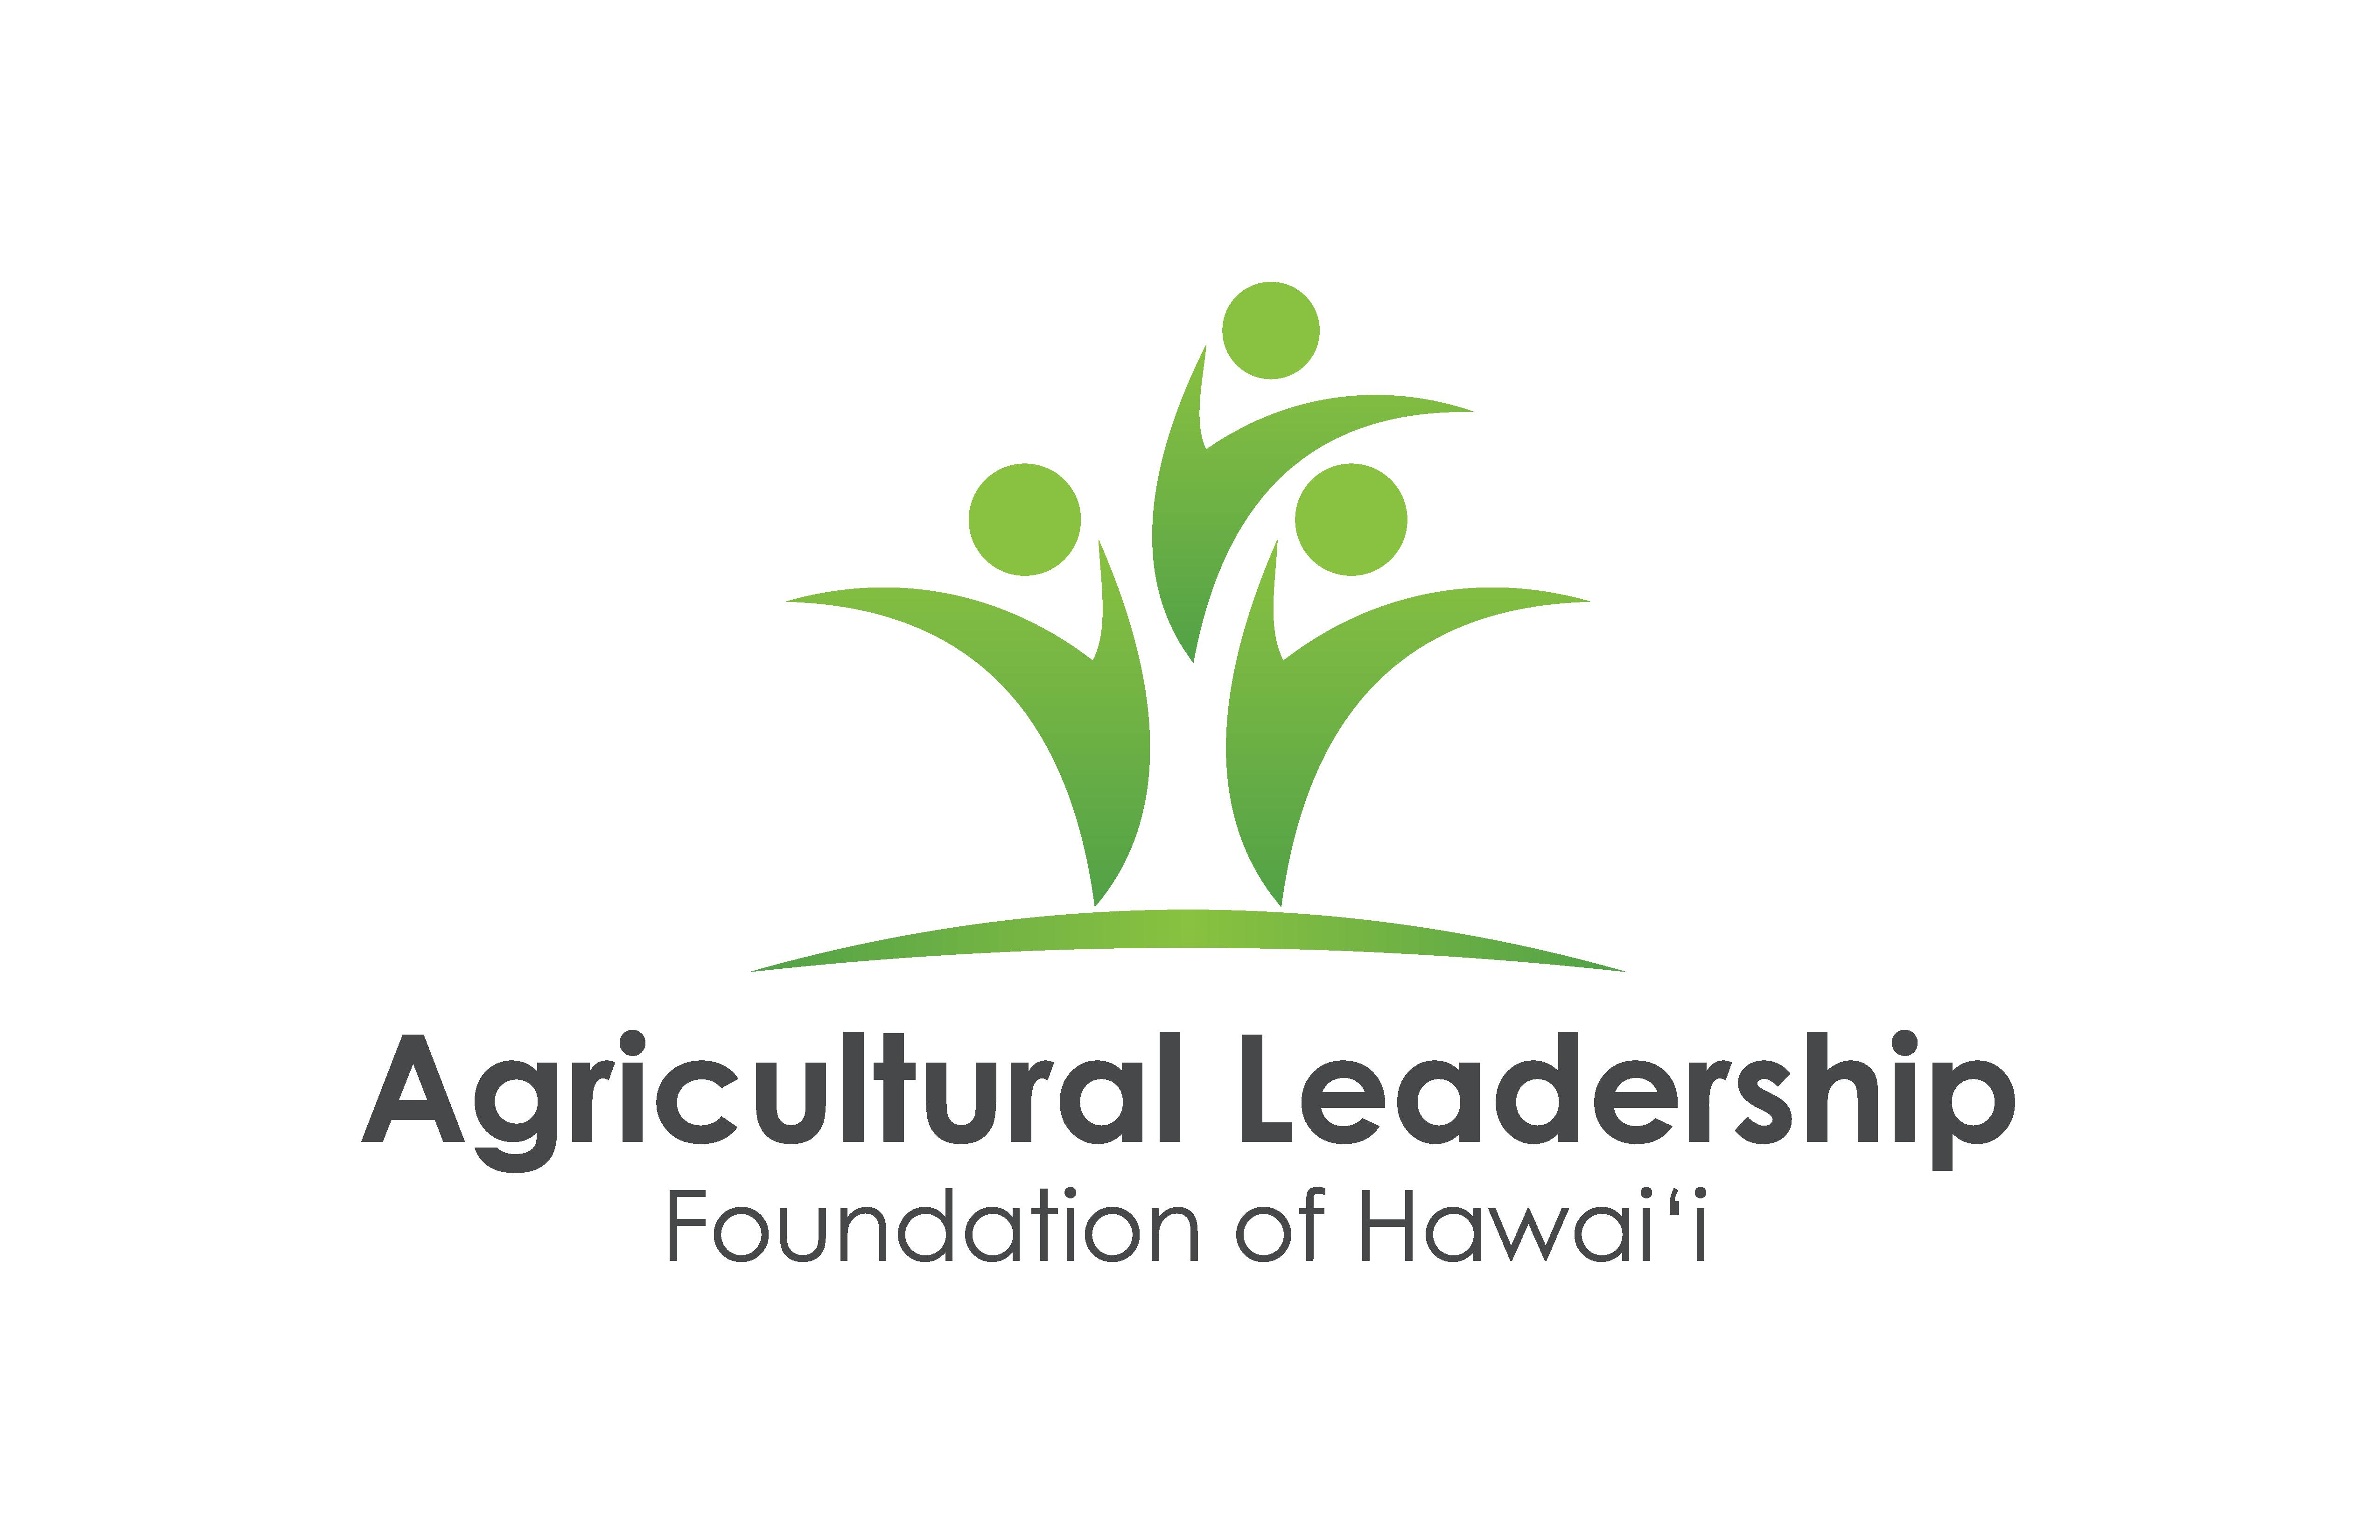 Agricultural Leadership Foundation of Hawai'i